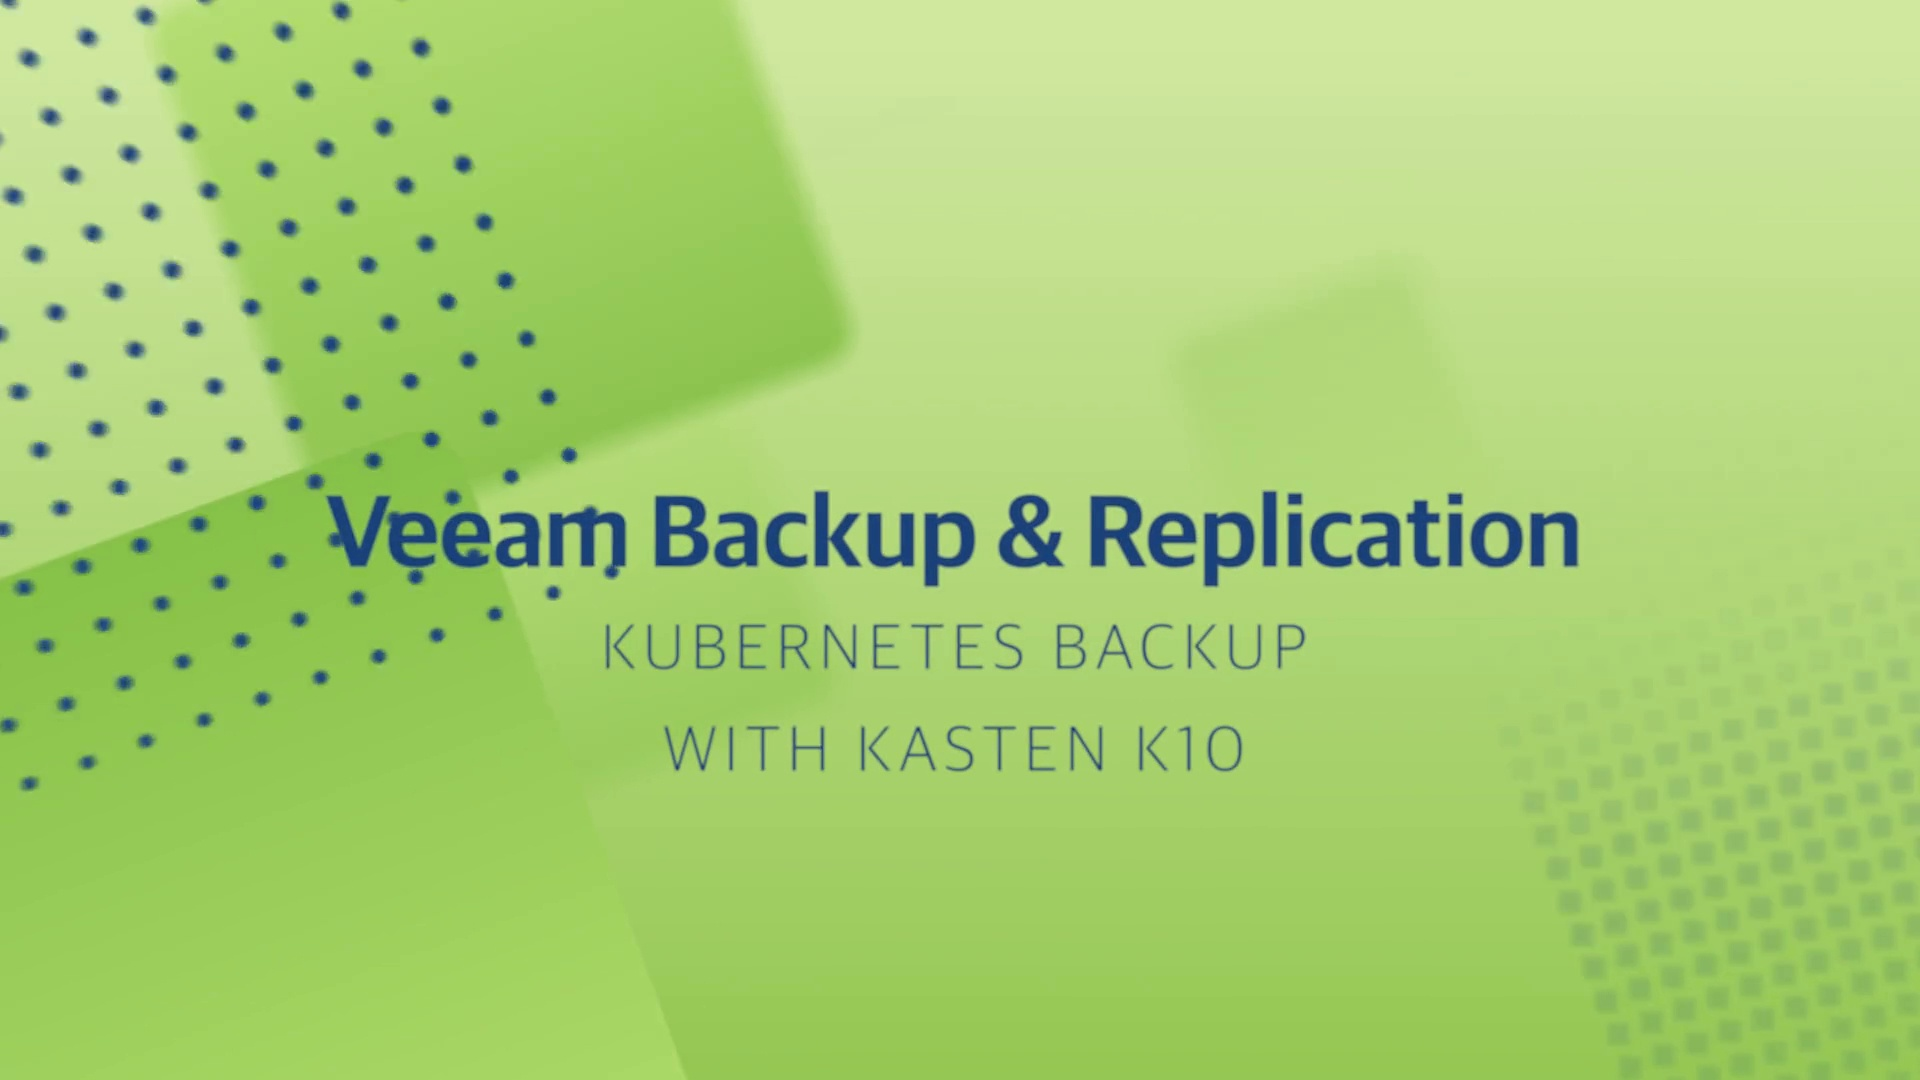 Product_ v11 Veeam Backup & Replication - Demo - Kubernetes Backup with Kasten K10 - 2021 -EN